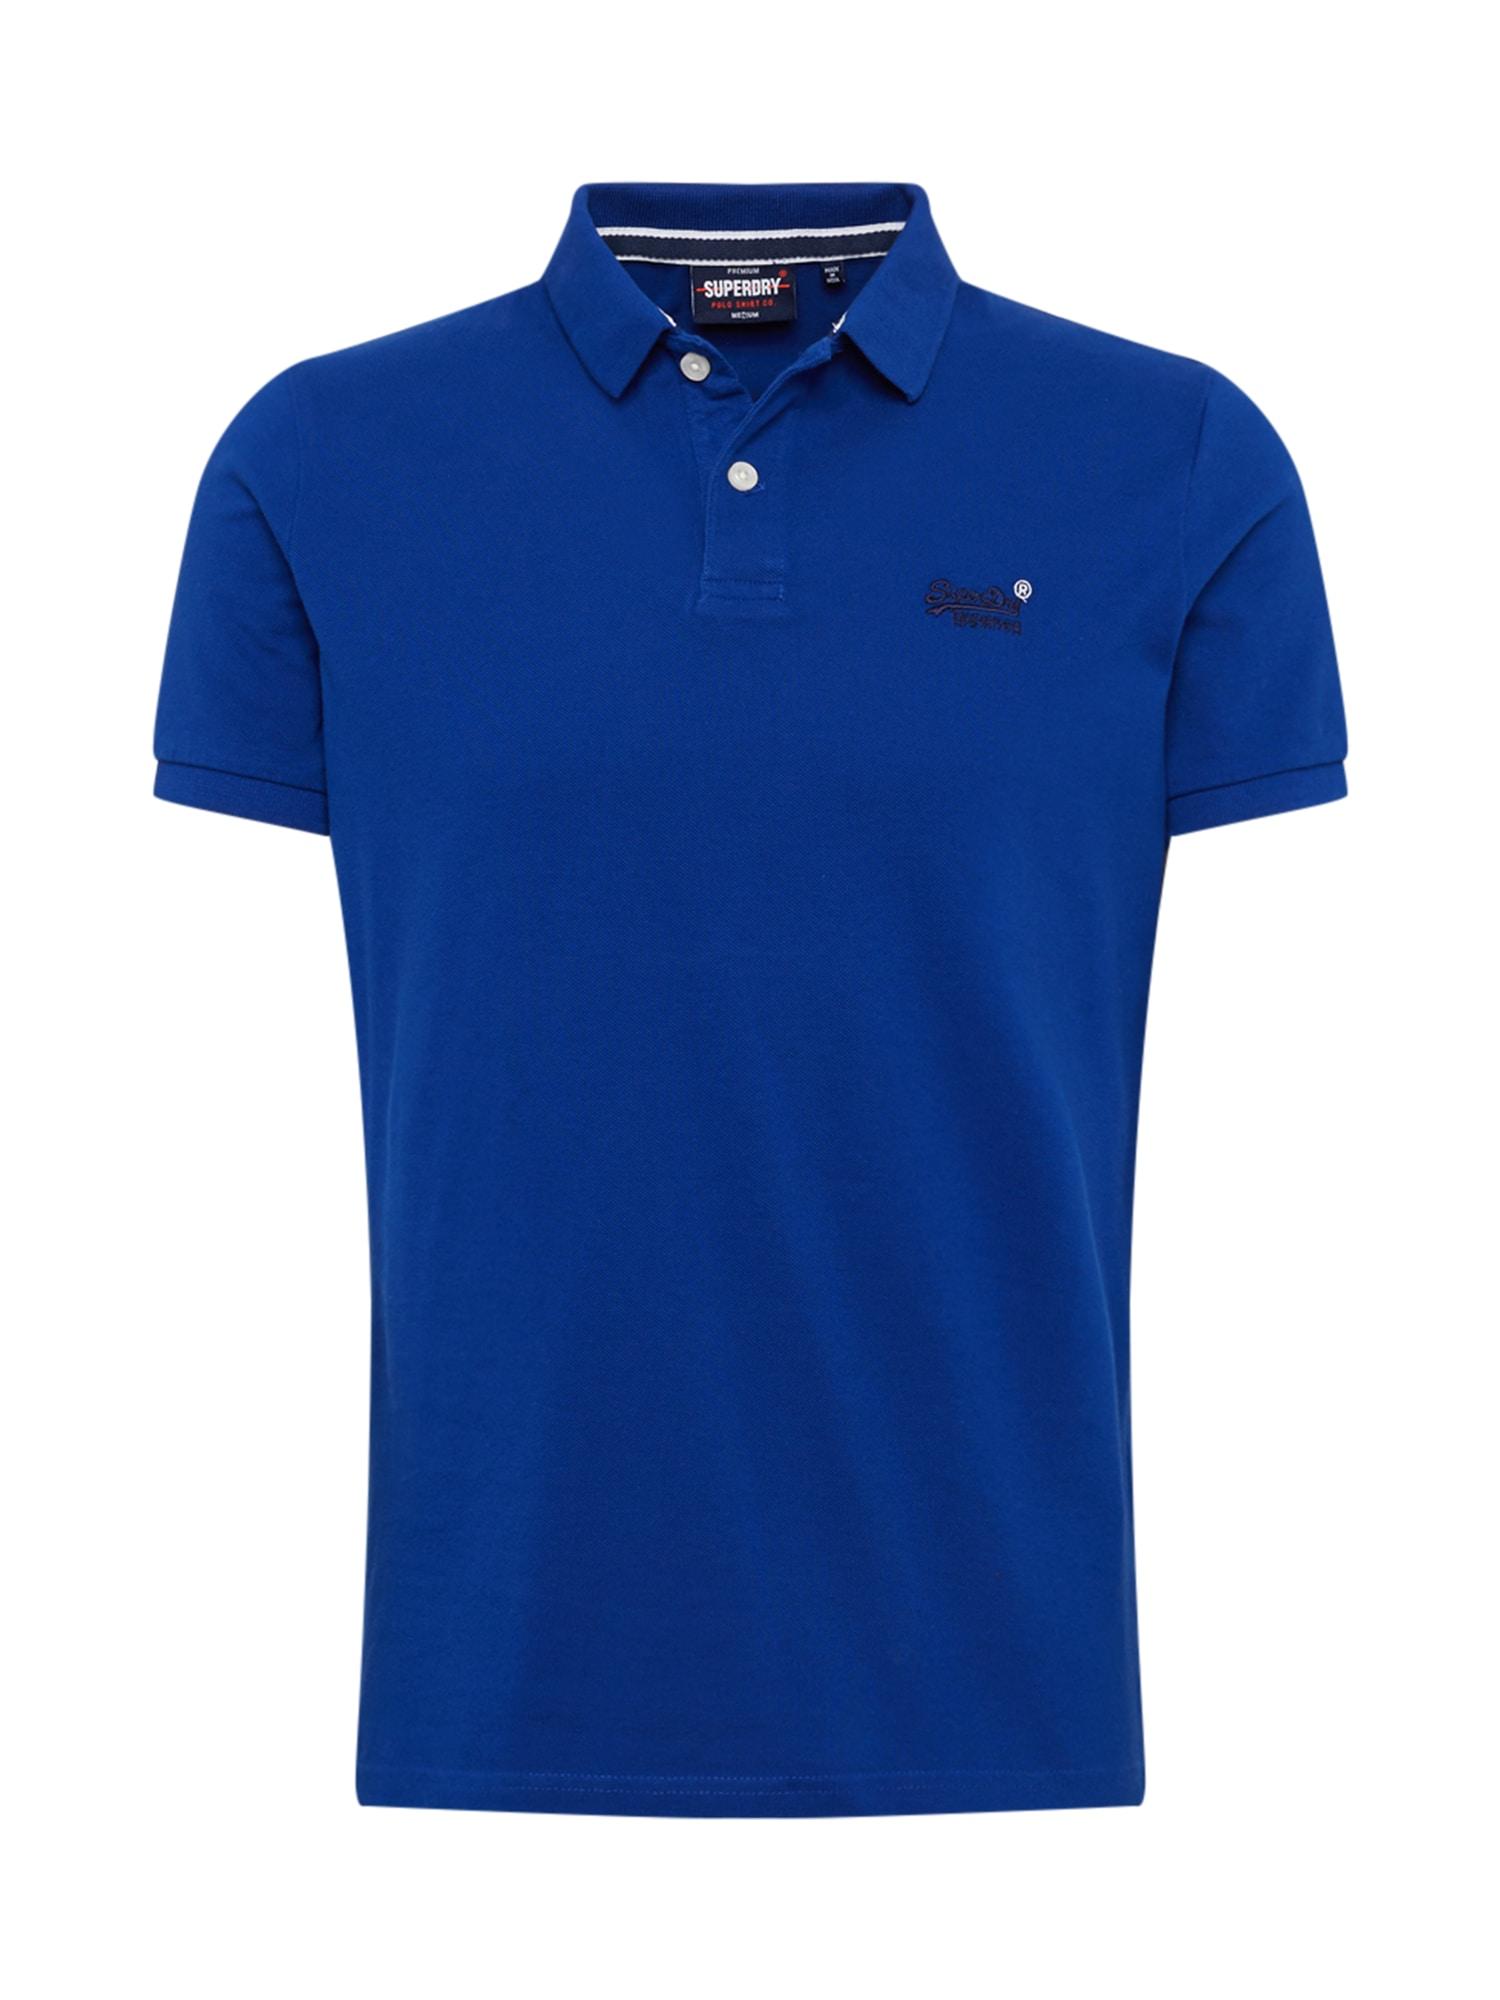 "Superdry Marškinėliai sodri mėlyna (""karališka"")"